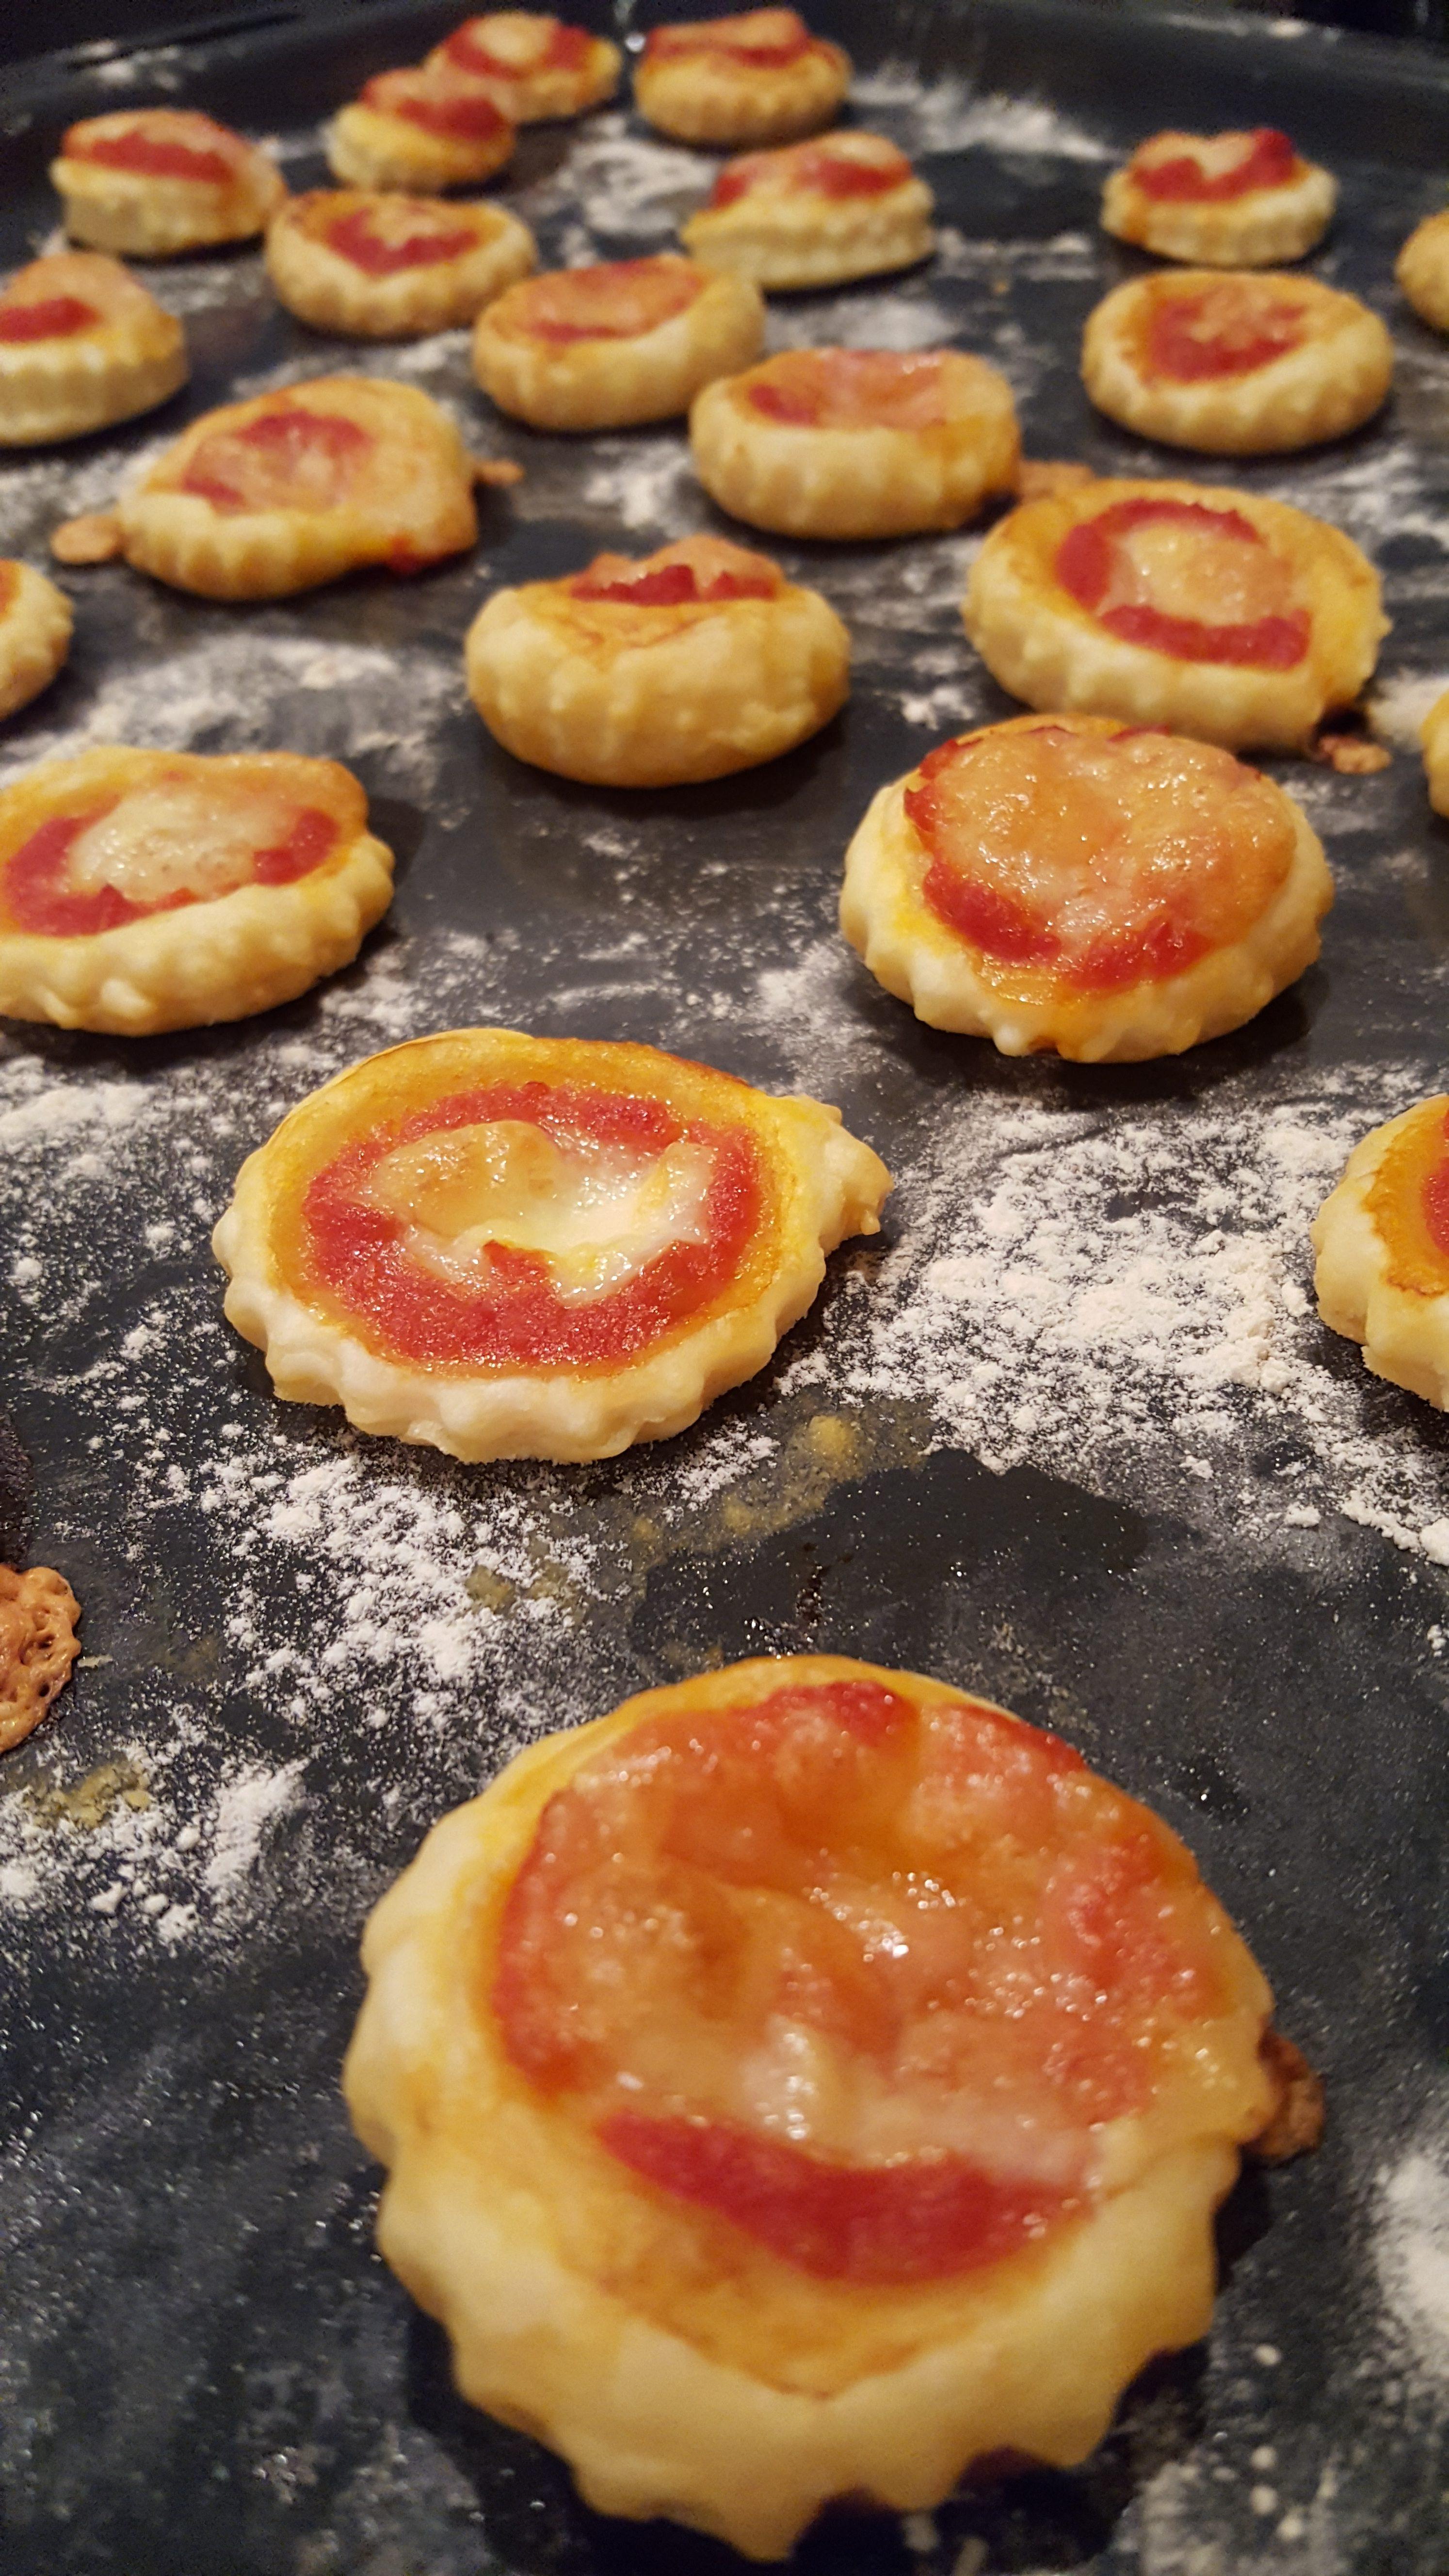 Pizzette di sfoglia